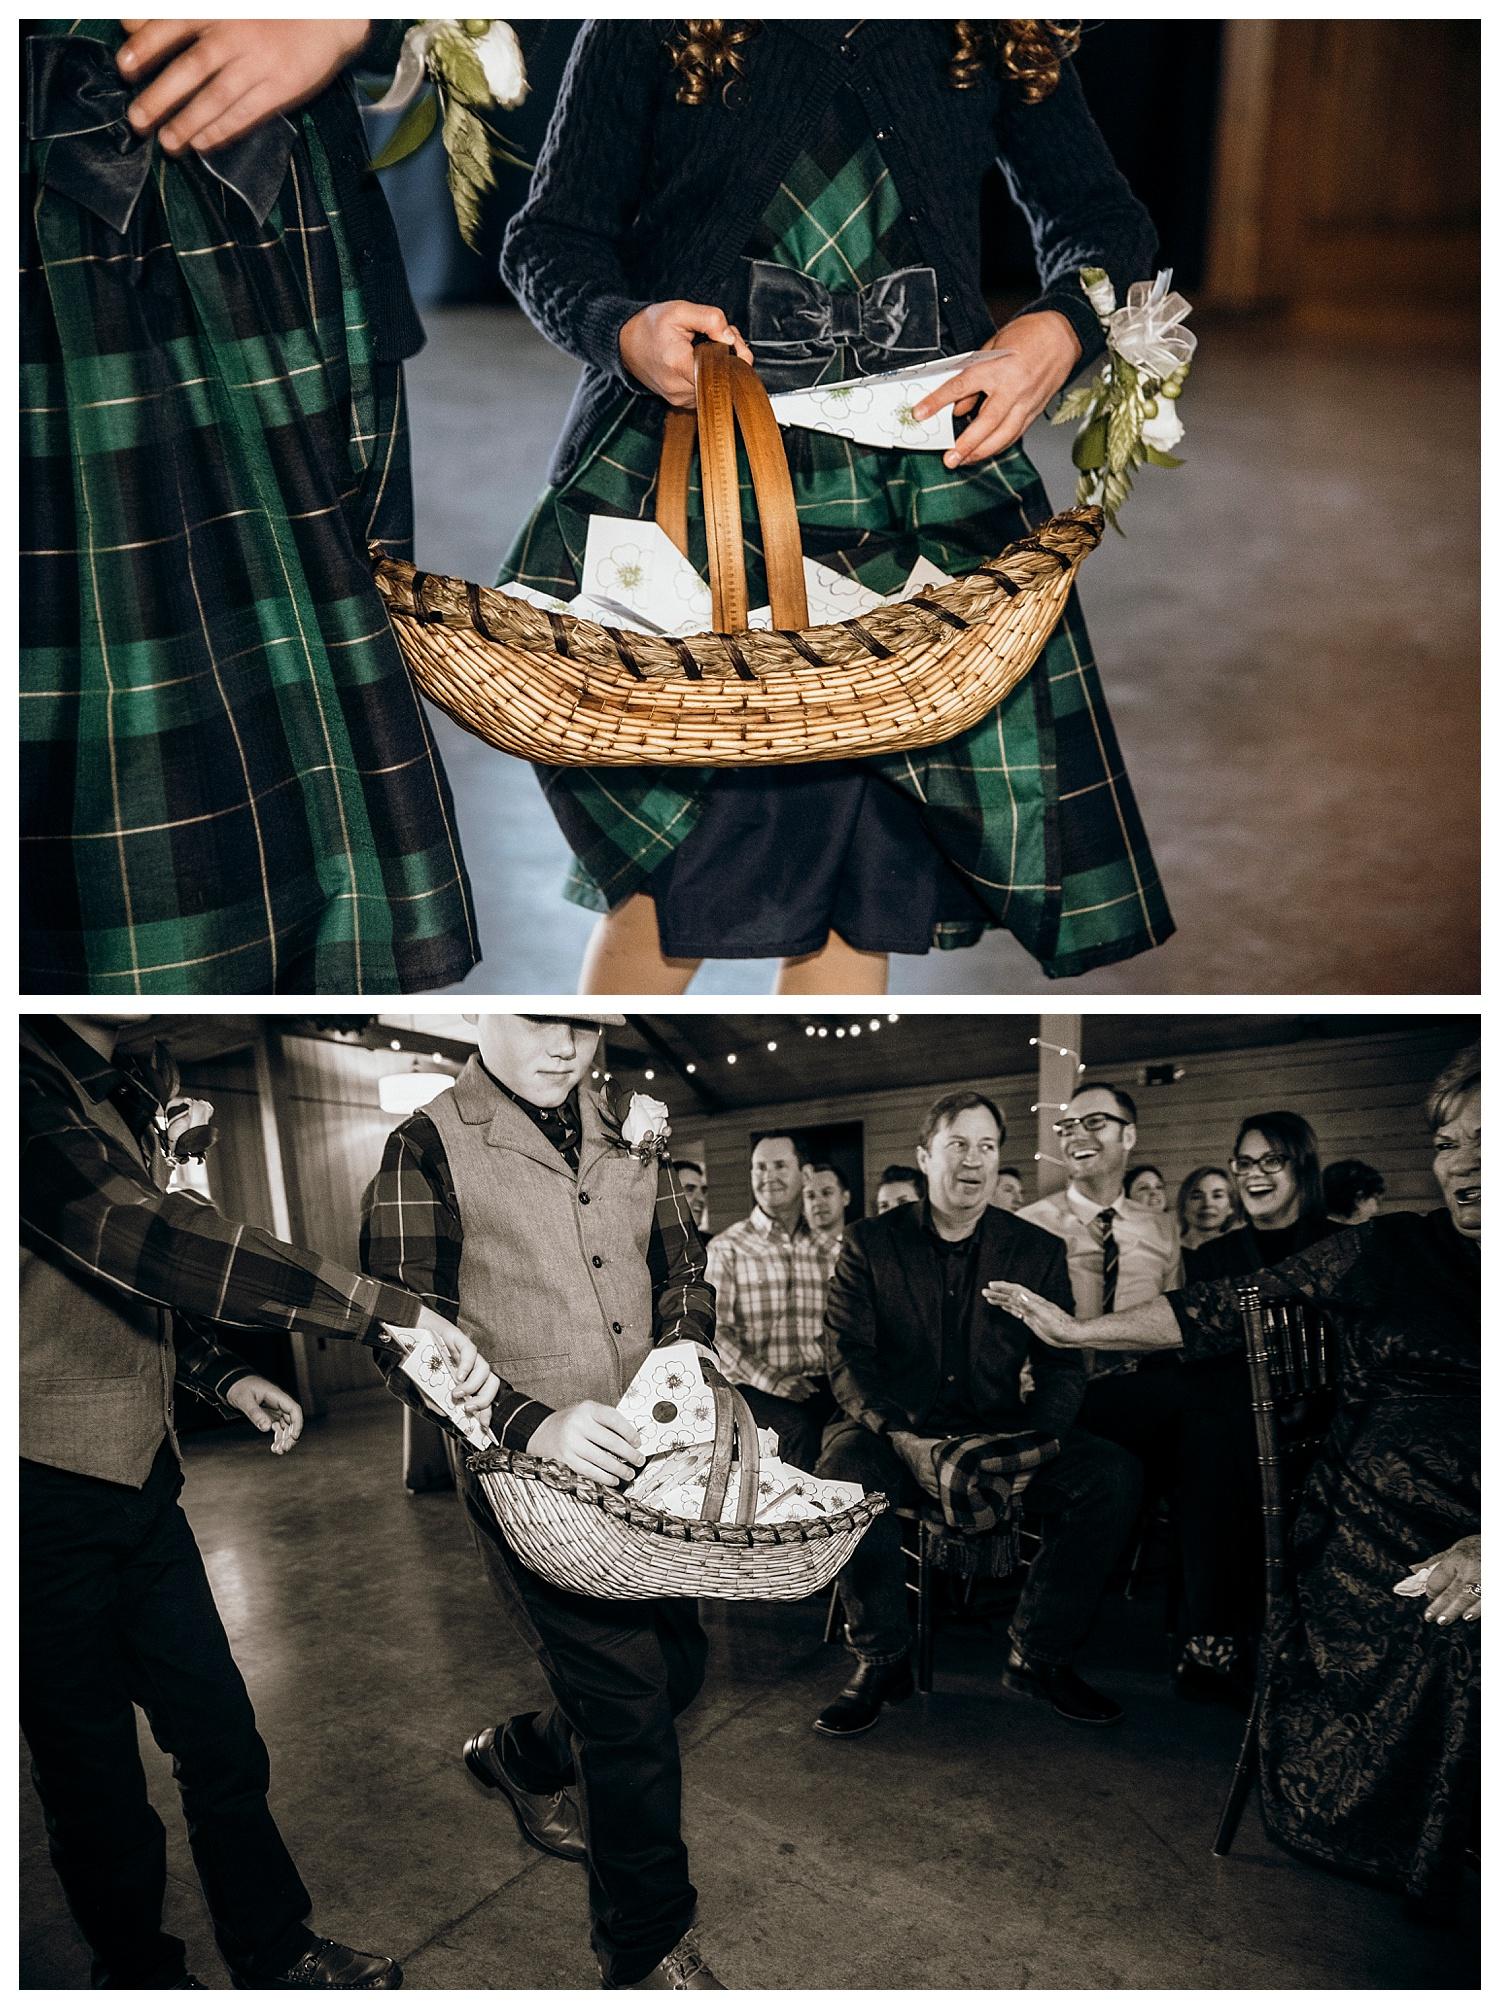 Ceremony_Ideas_The_Barn_At_Raccoon_Creek_Wedding_Apollo_Fields_029.jpg